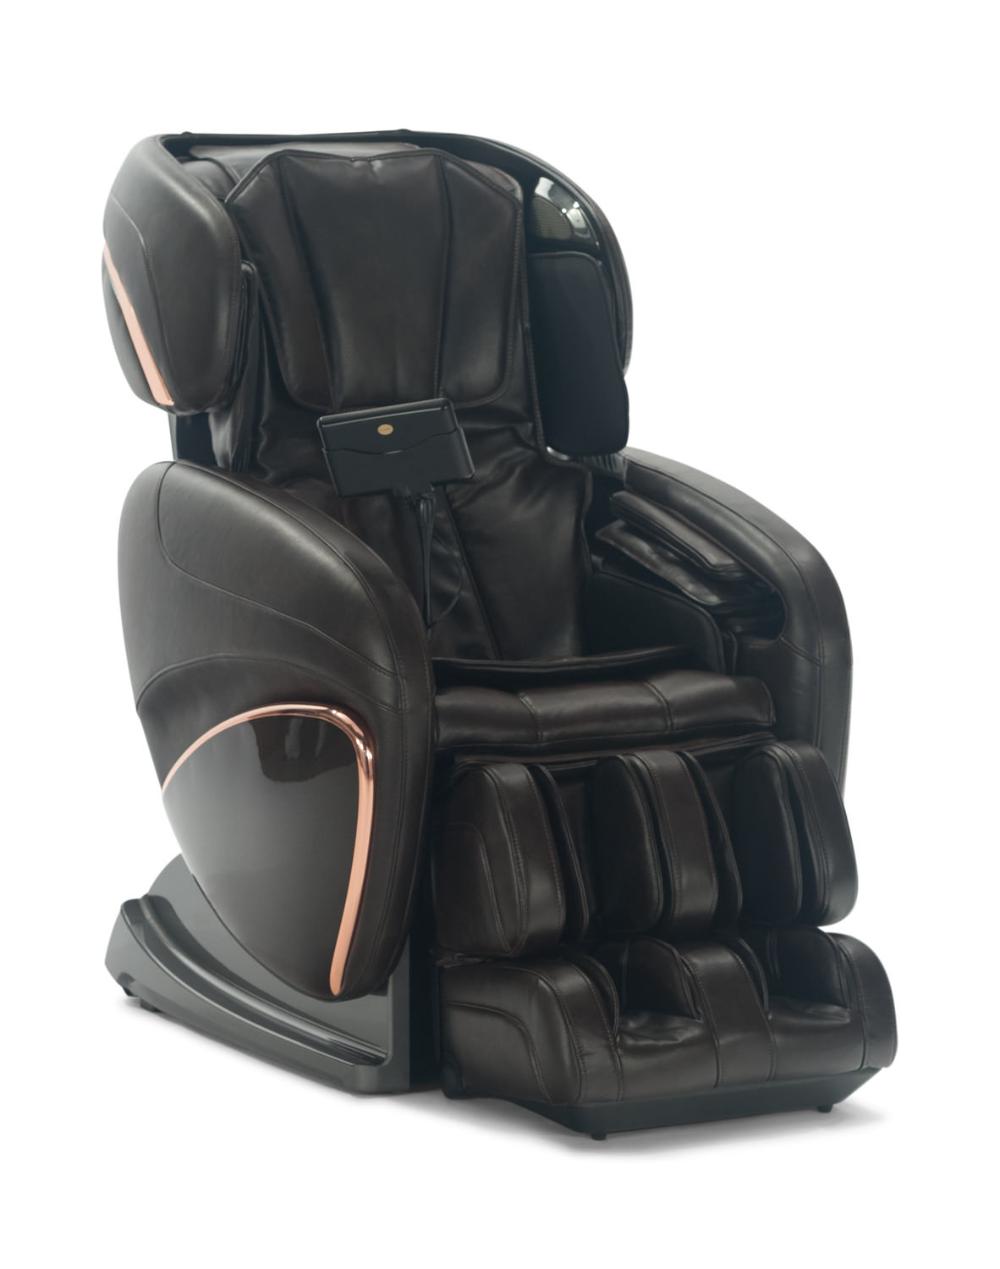 Marshal Zero Gravity Massage Chair By Cozzia Hom Furniture Massage Chair Feet Roller Hom Furniture